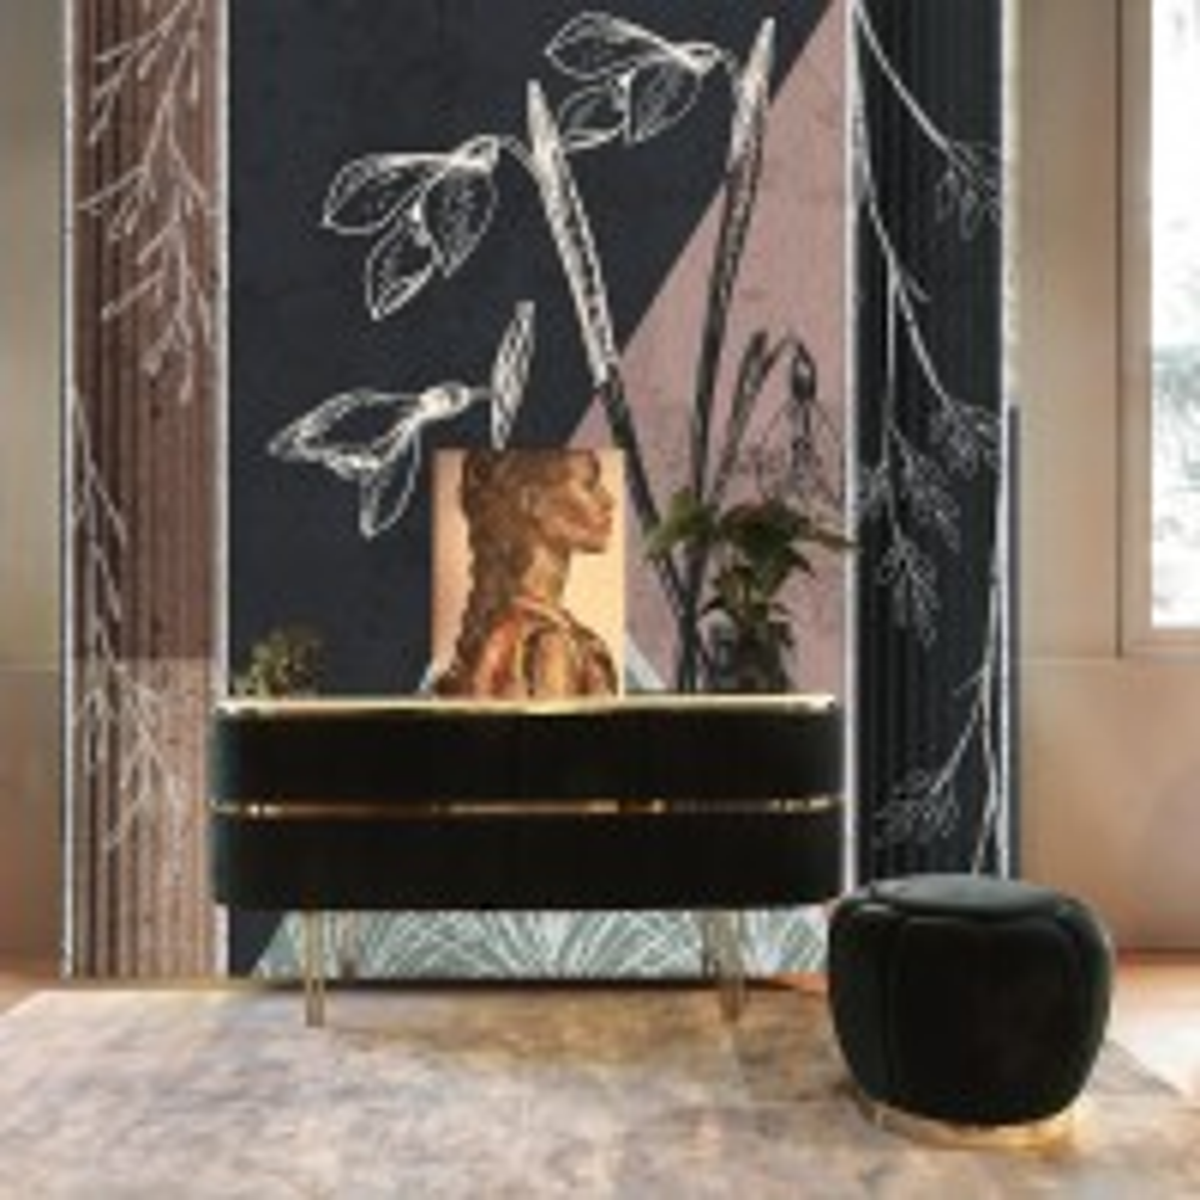 Abstract Floral Art Wallpaper Mural